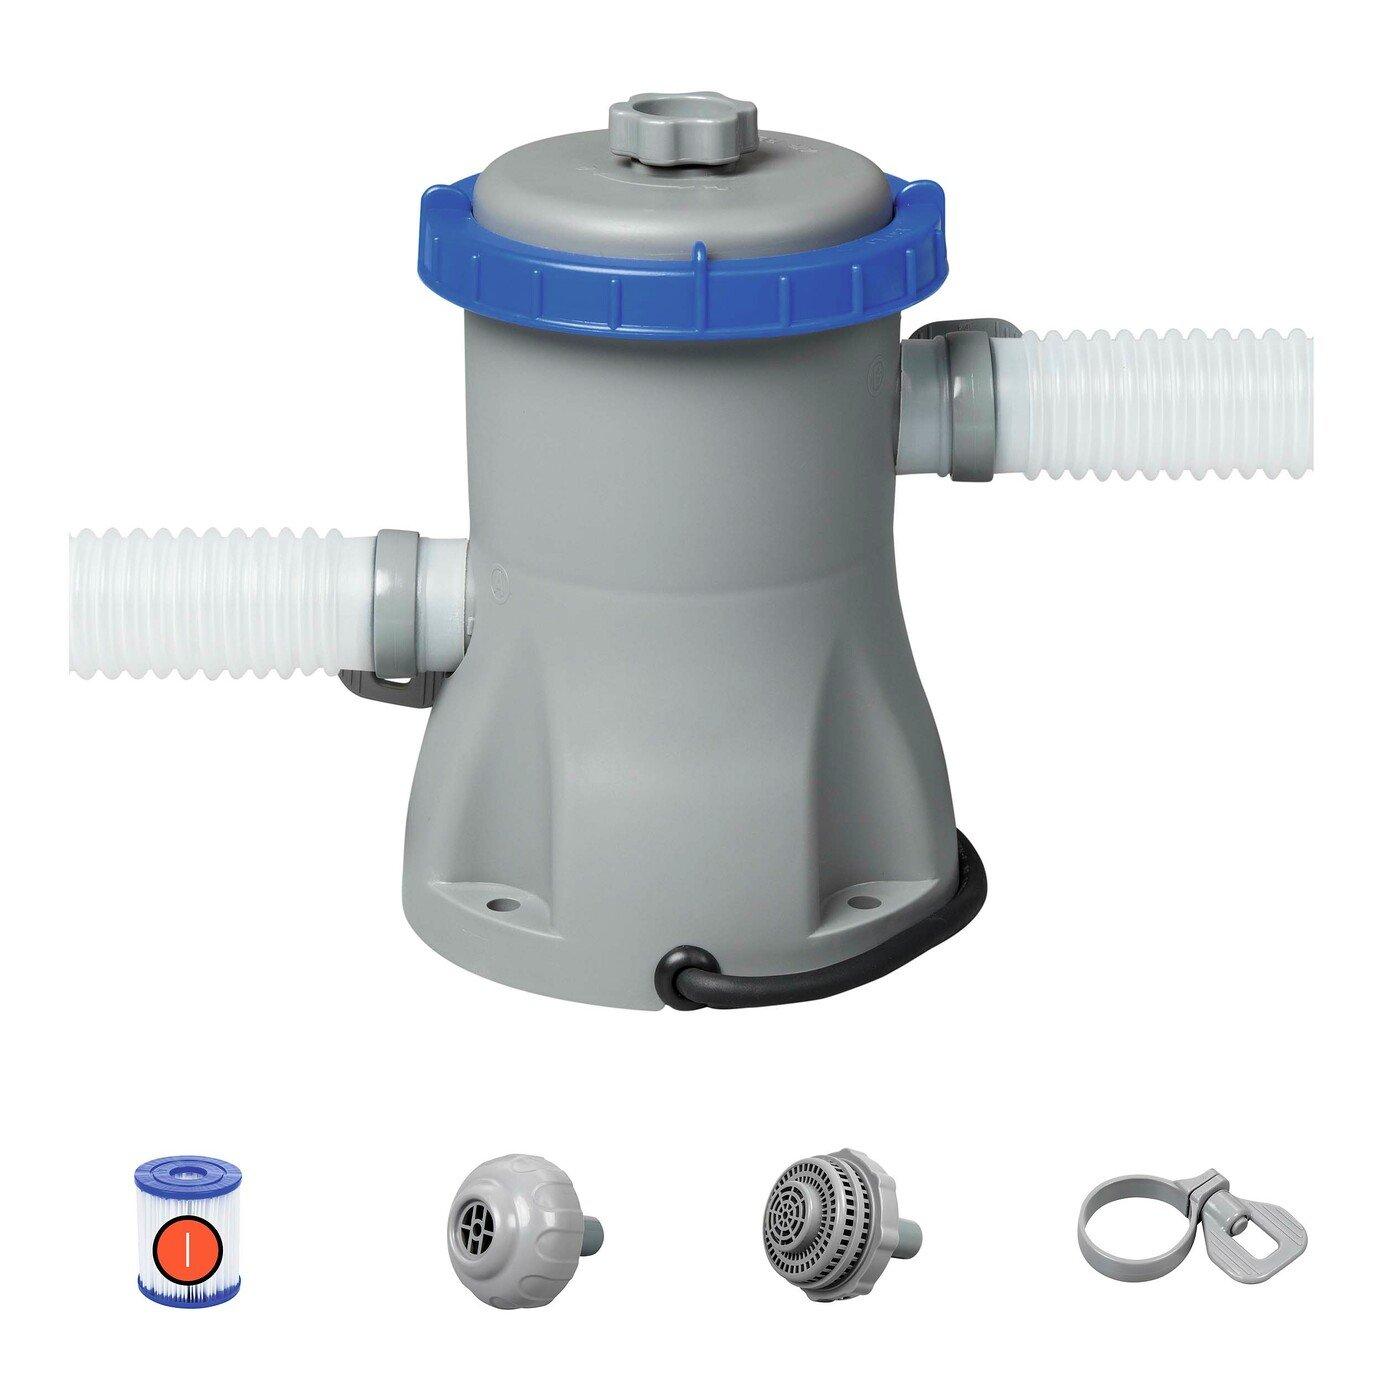 Bestway Flowclear 330 Gallon Water Filter Pump